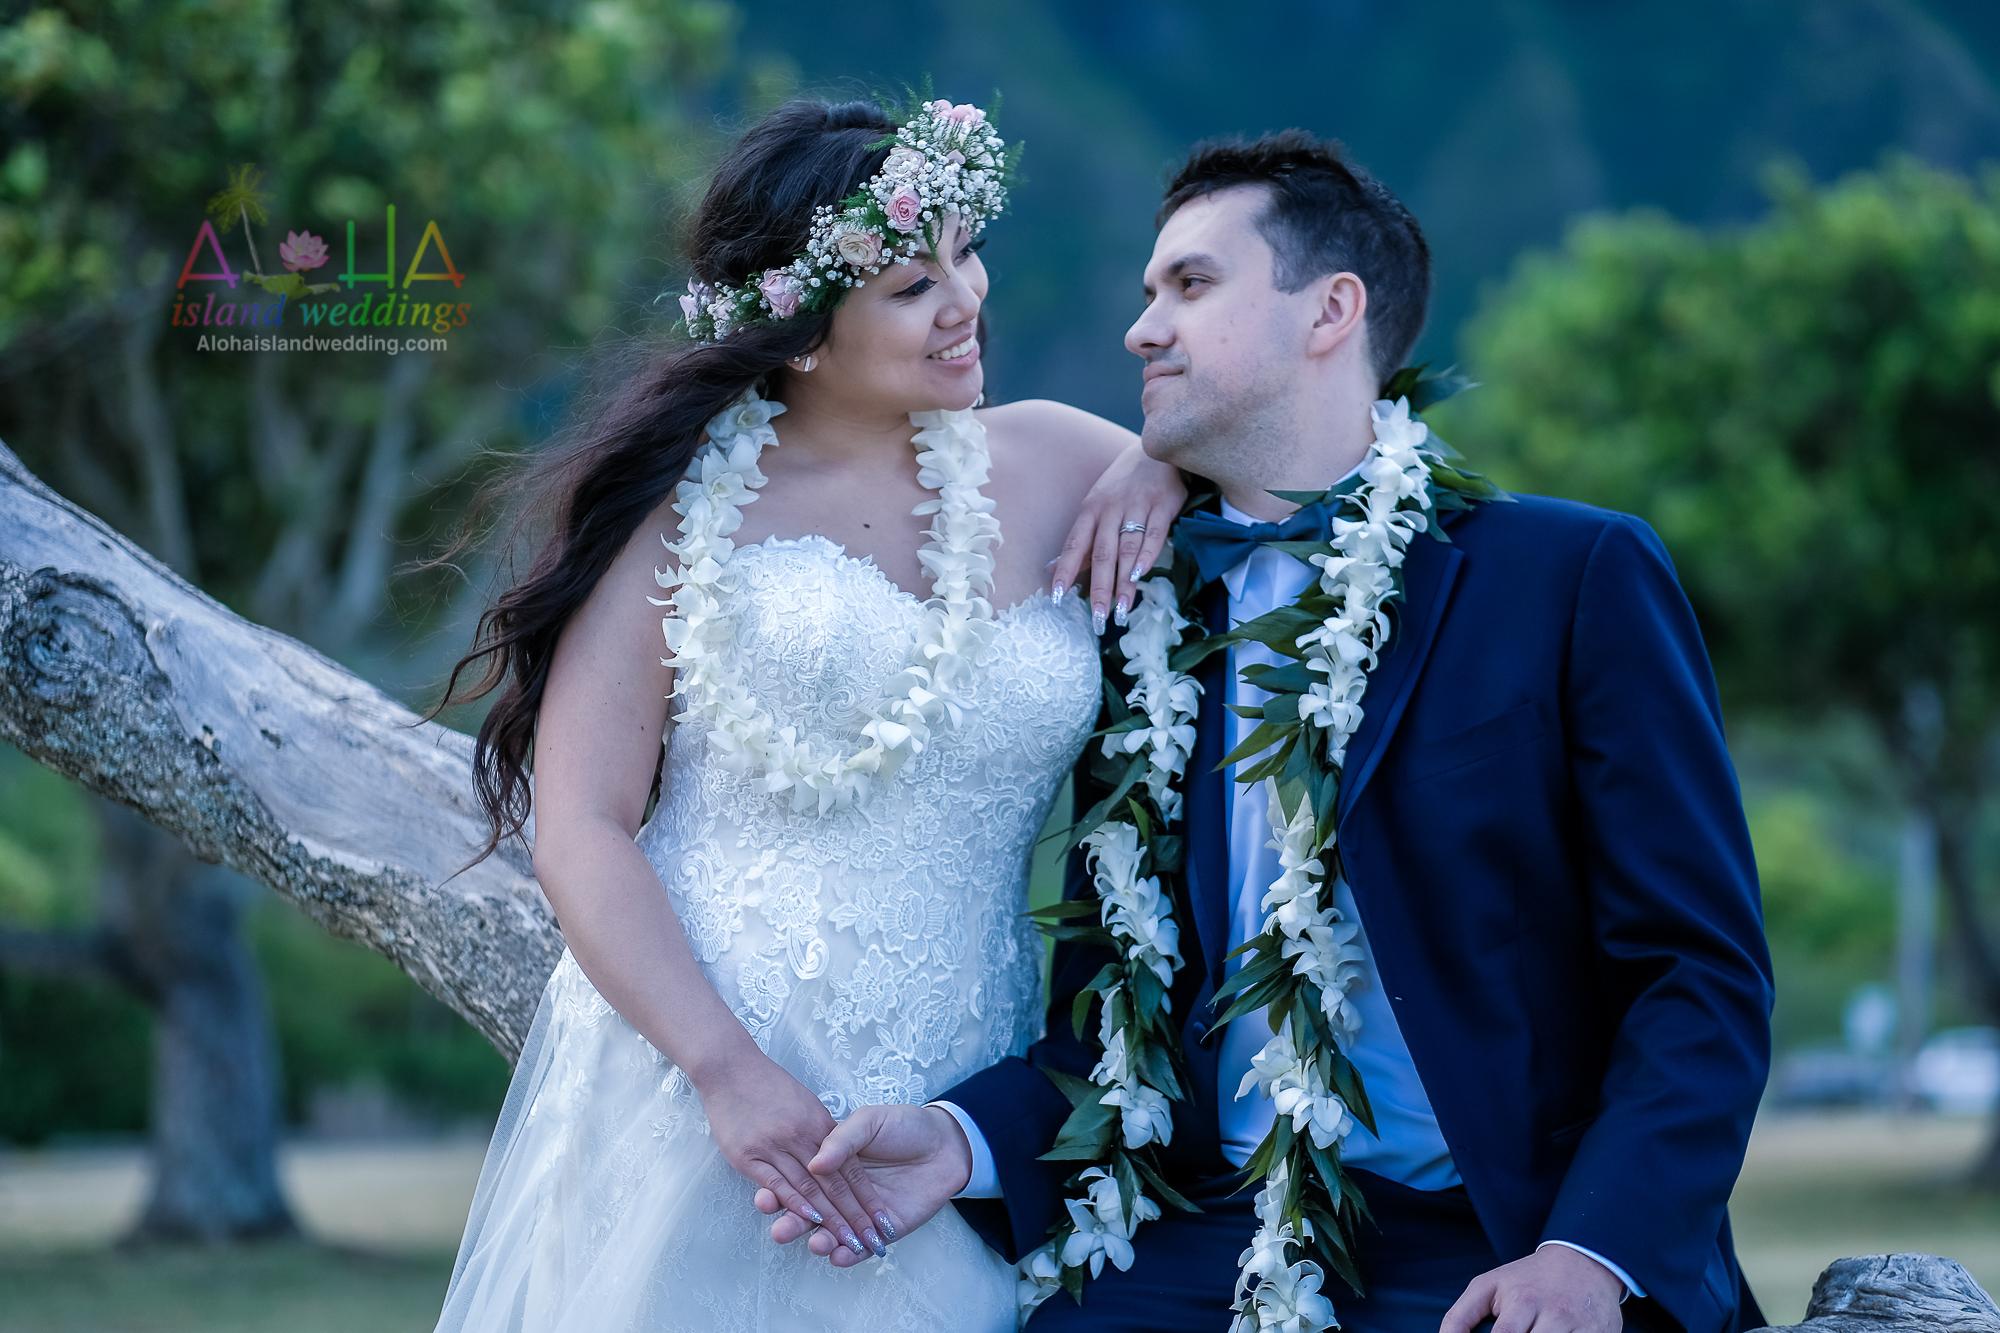 Hawaii weddings and events, Kualoa-17